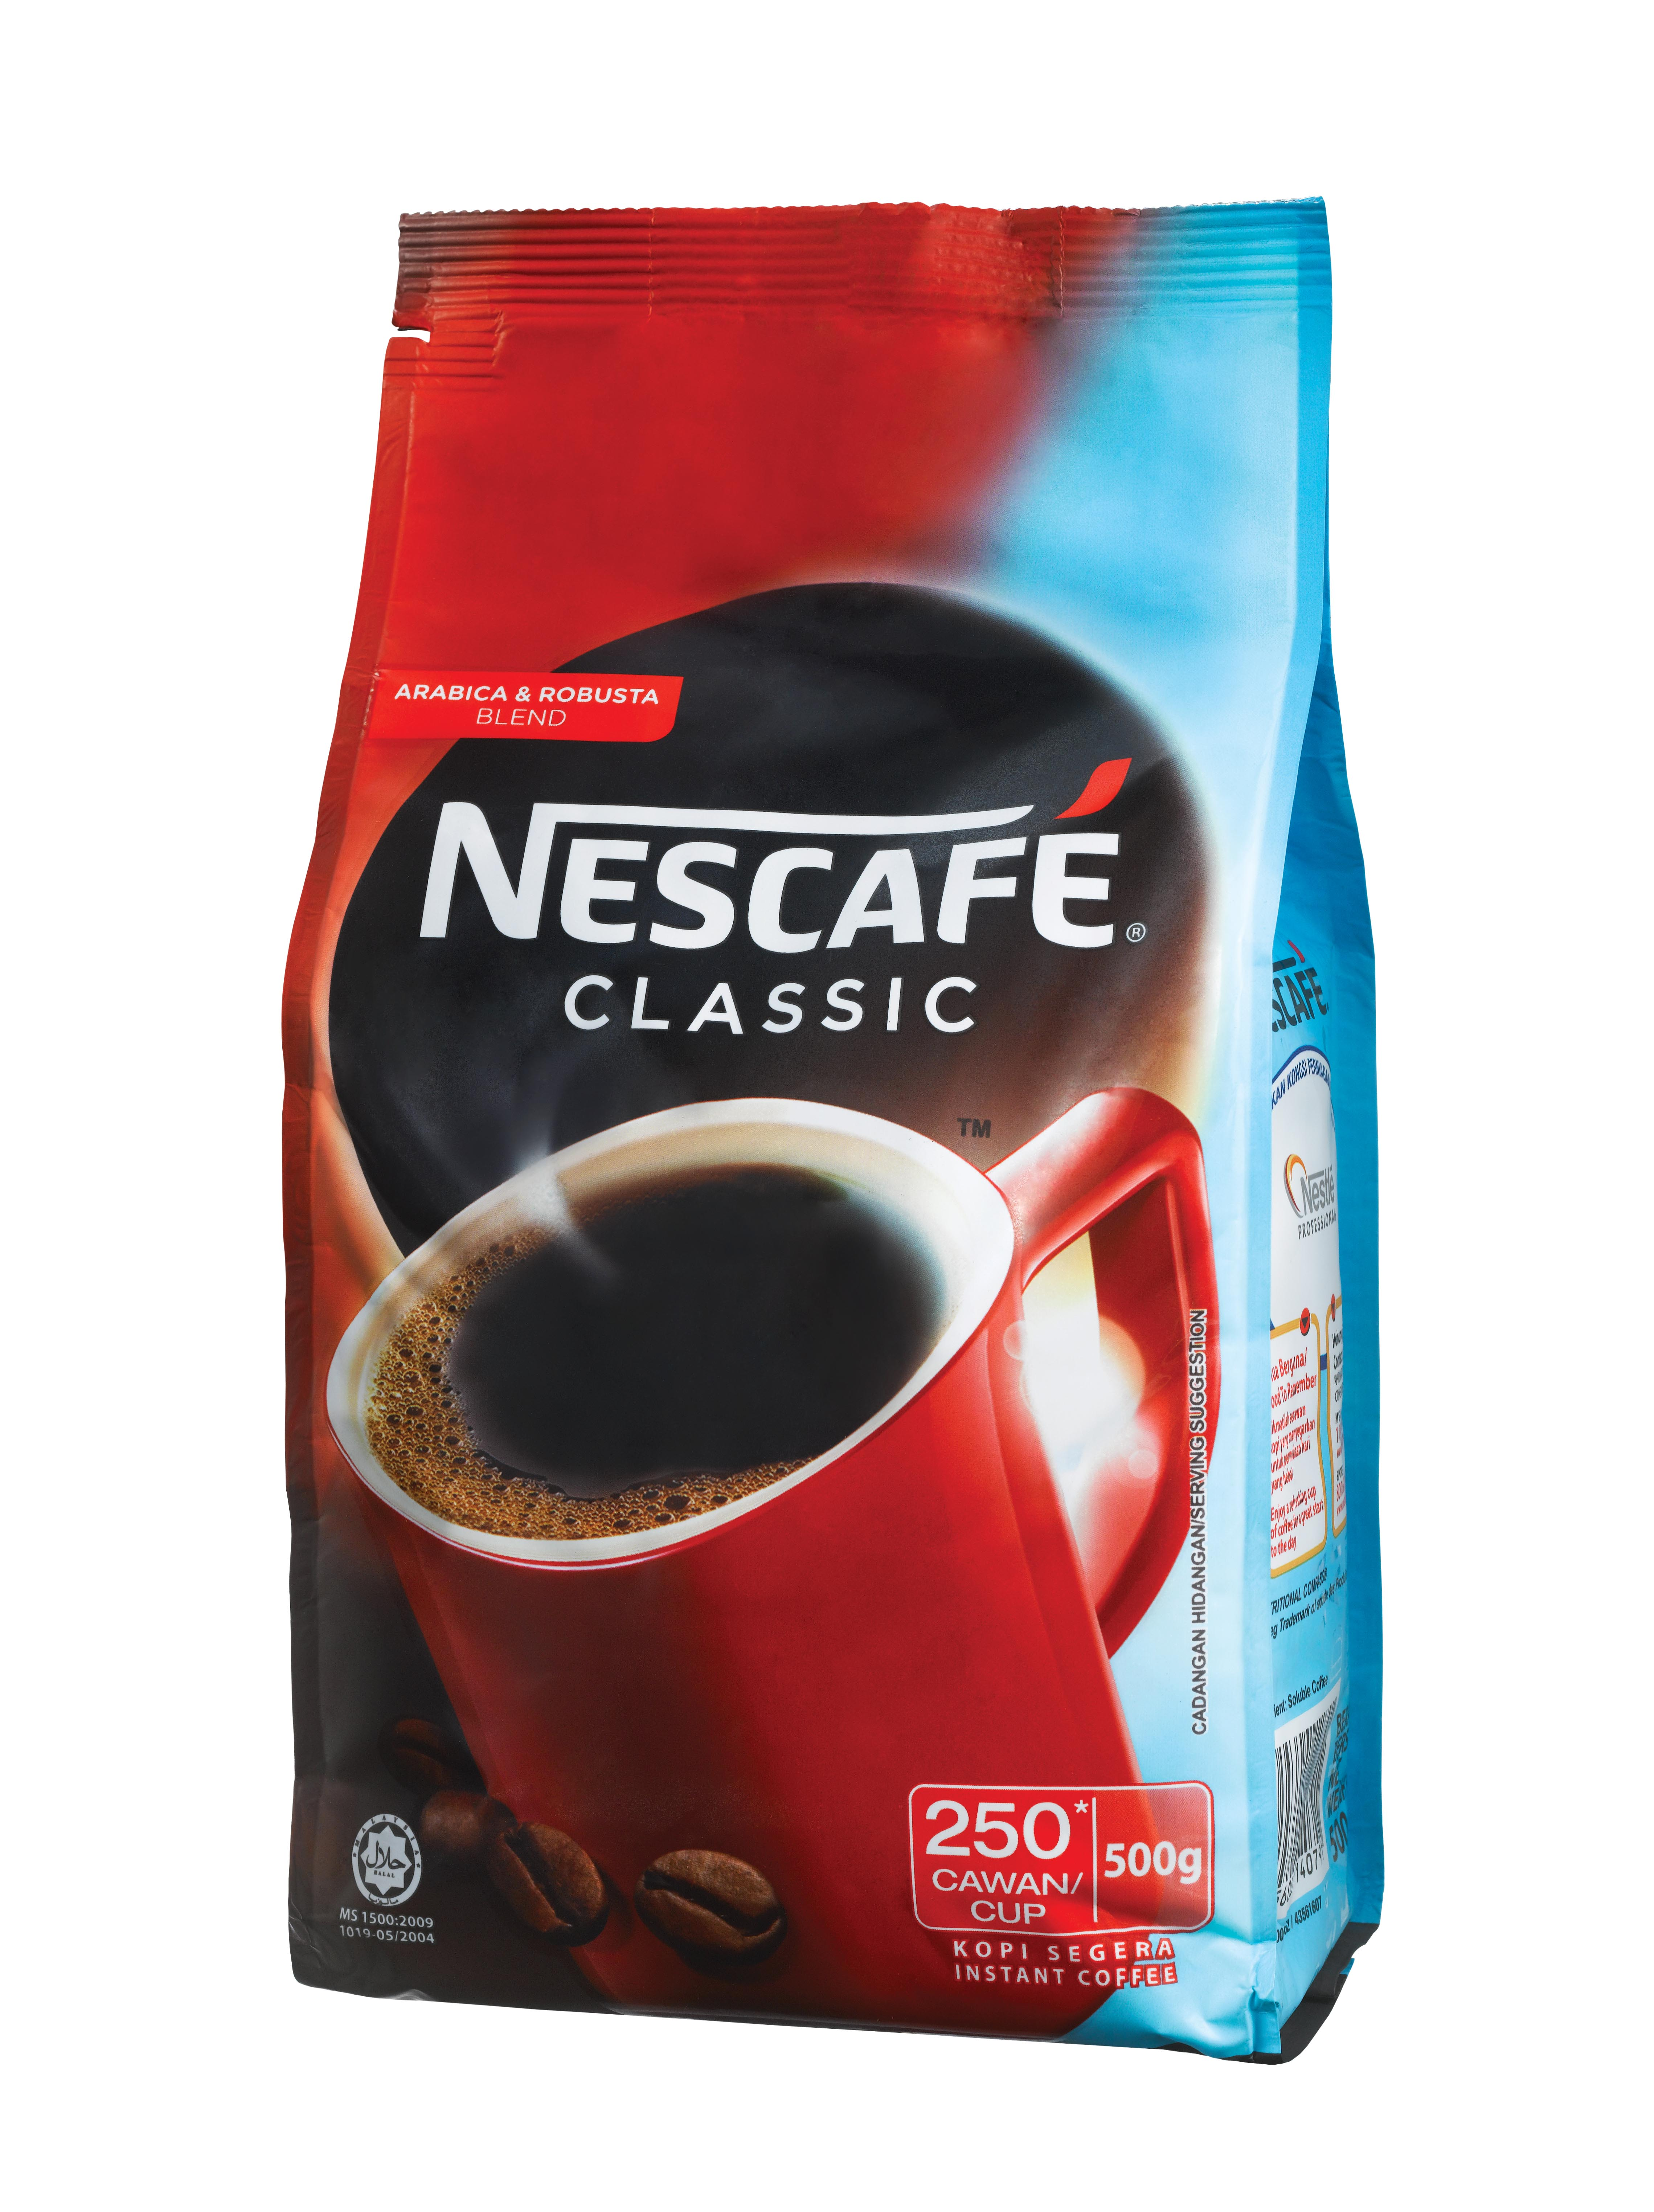 NESCAFE CLASSIC Refill Pack